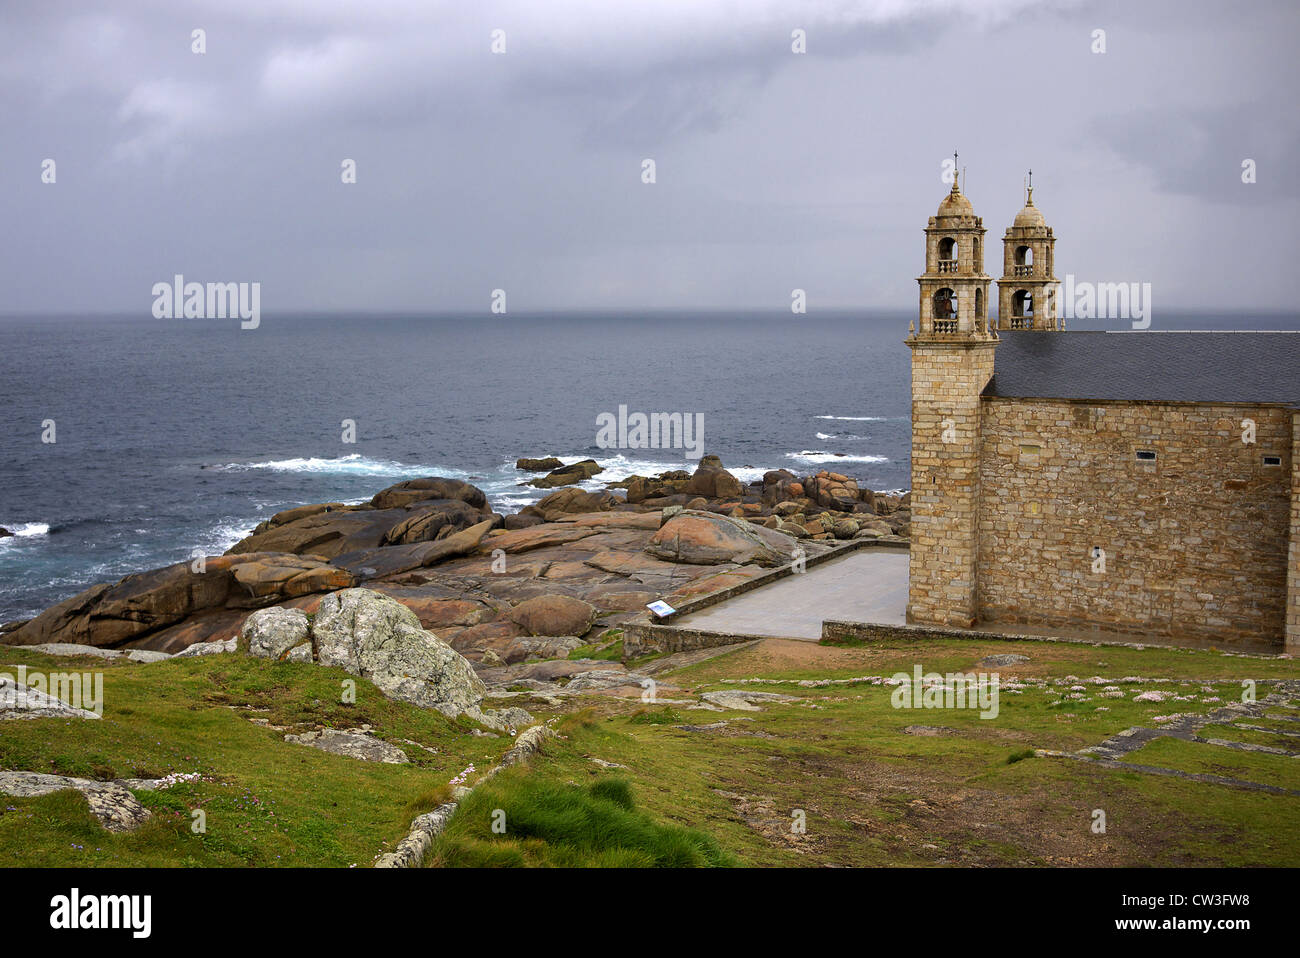 The Church of Santa Maria de Barca in Muxia, Spain. - Stock Image